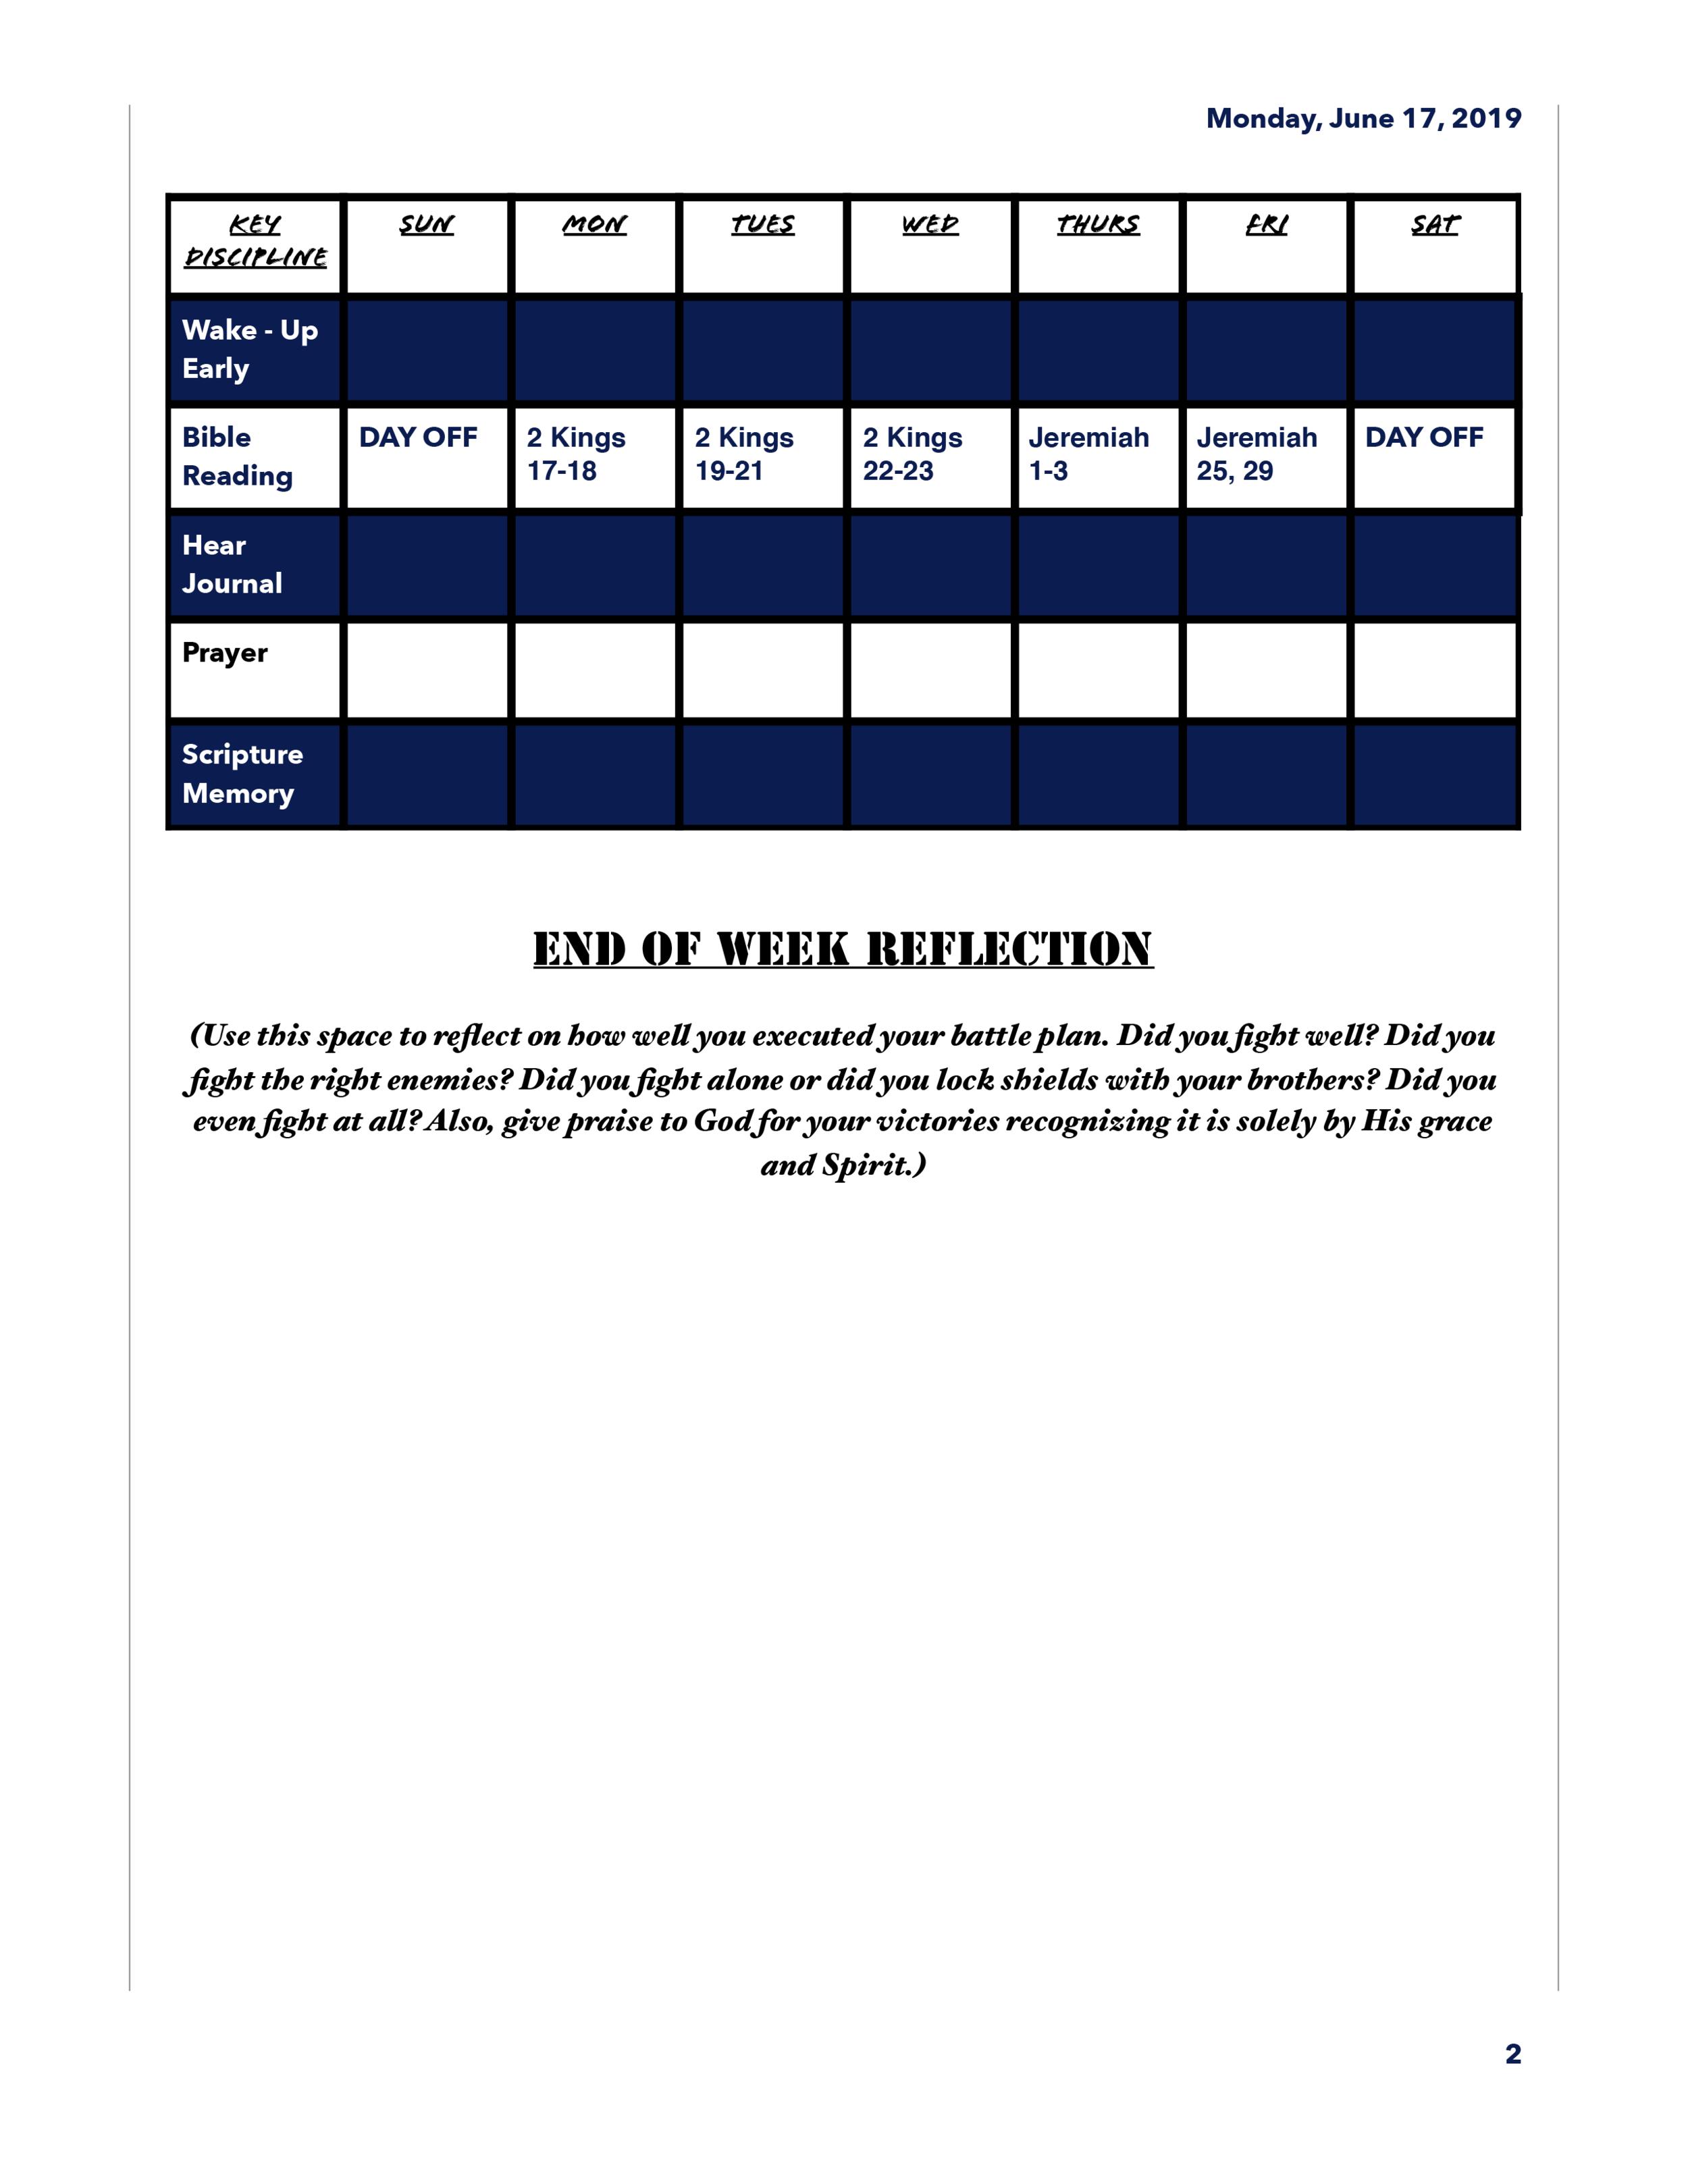 Battle Plan 6.17.19-2.png